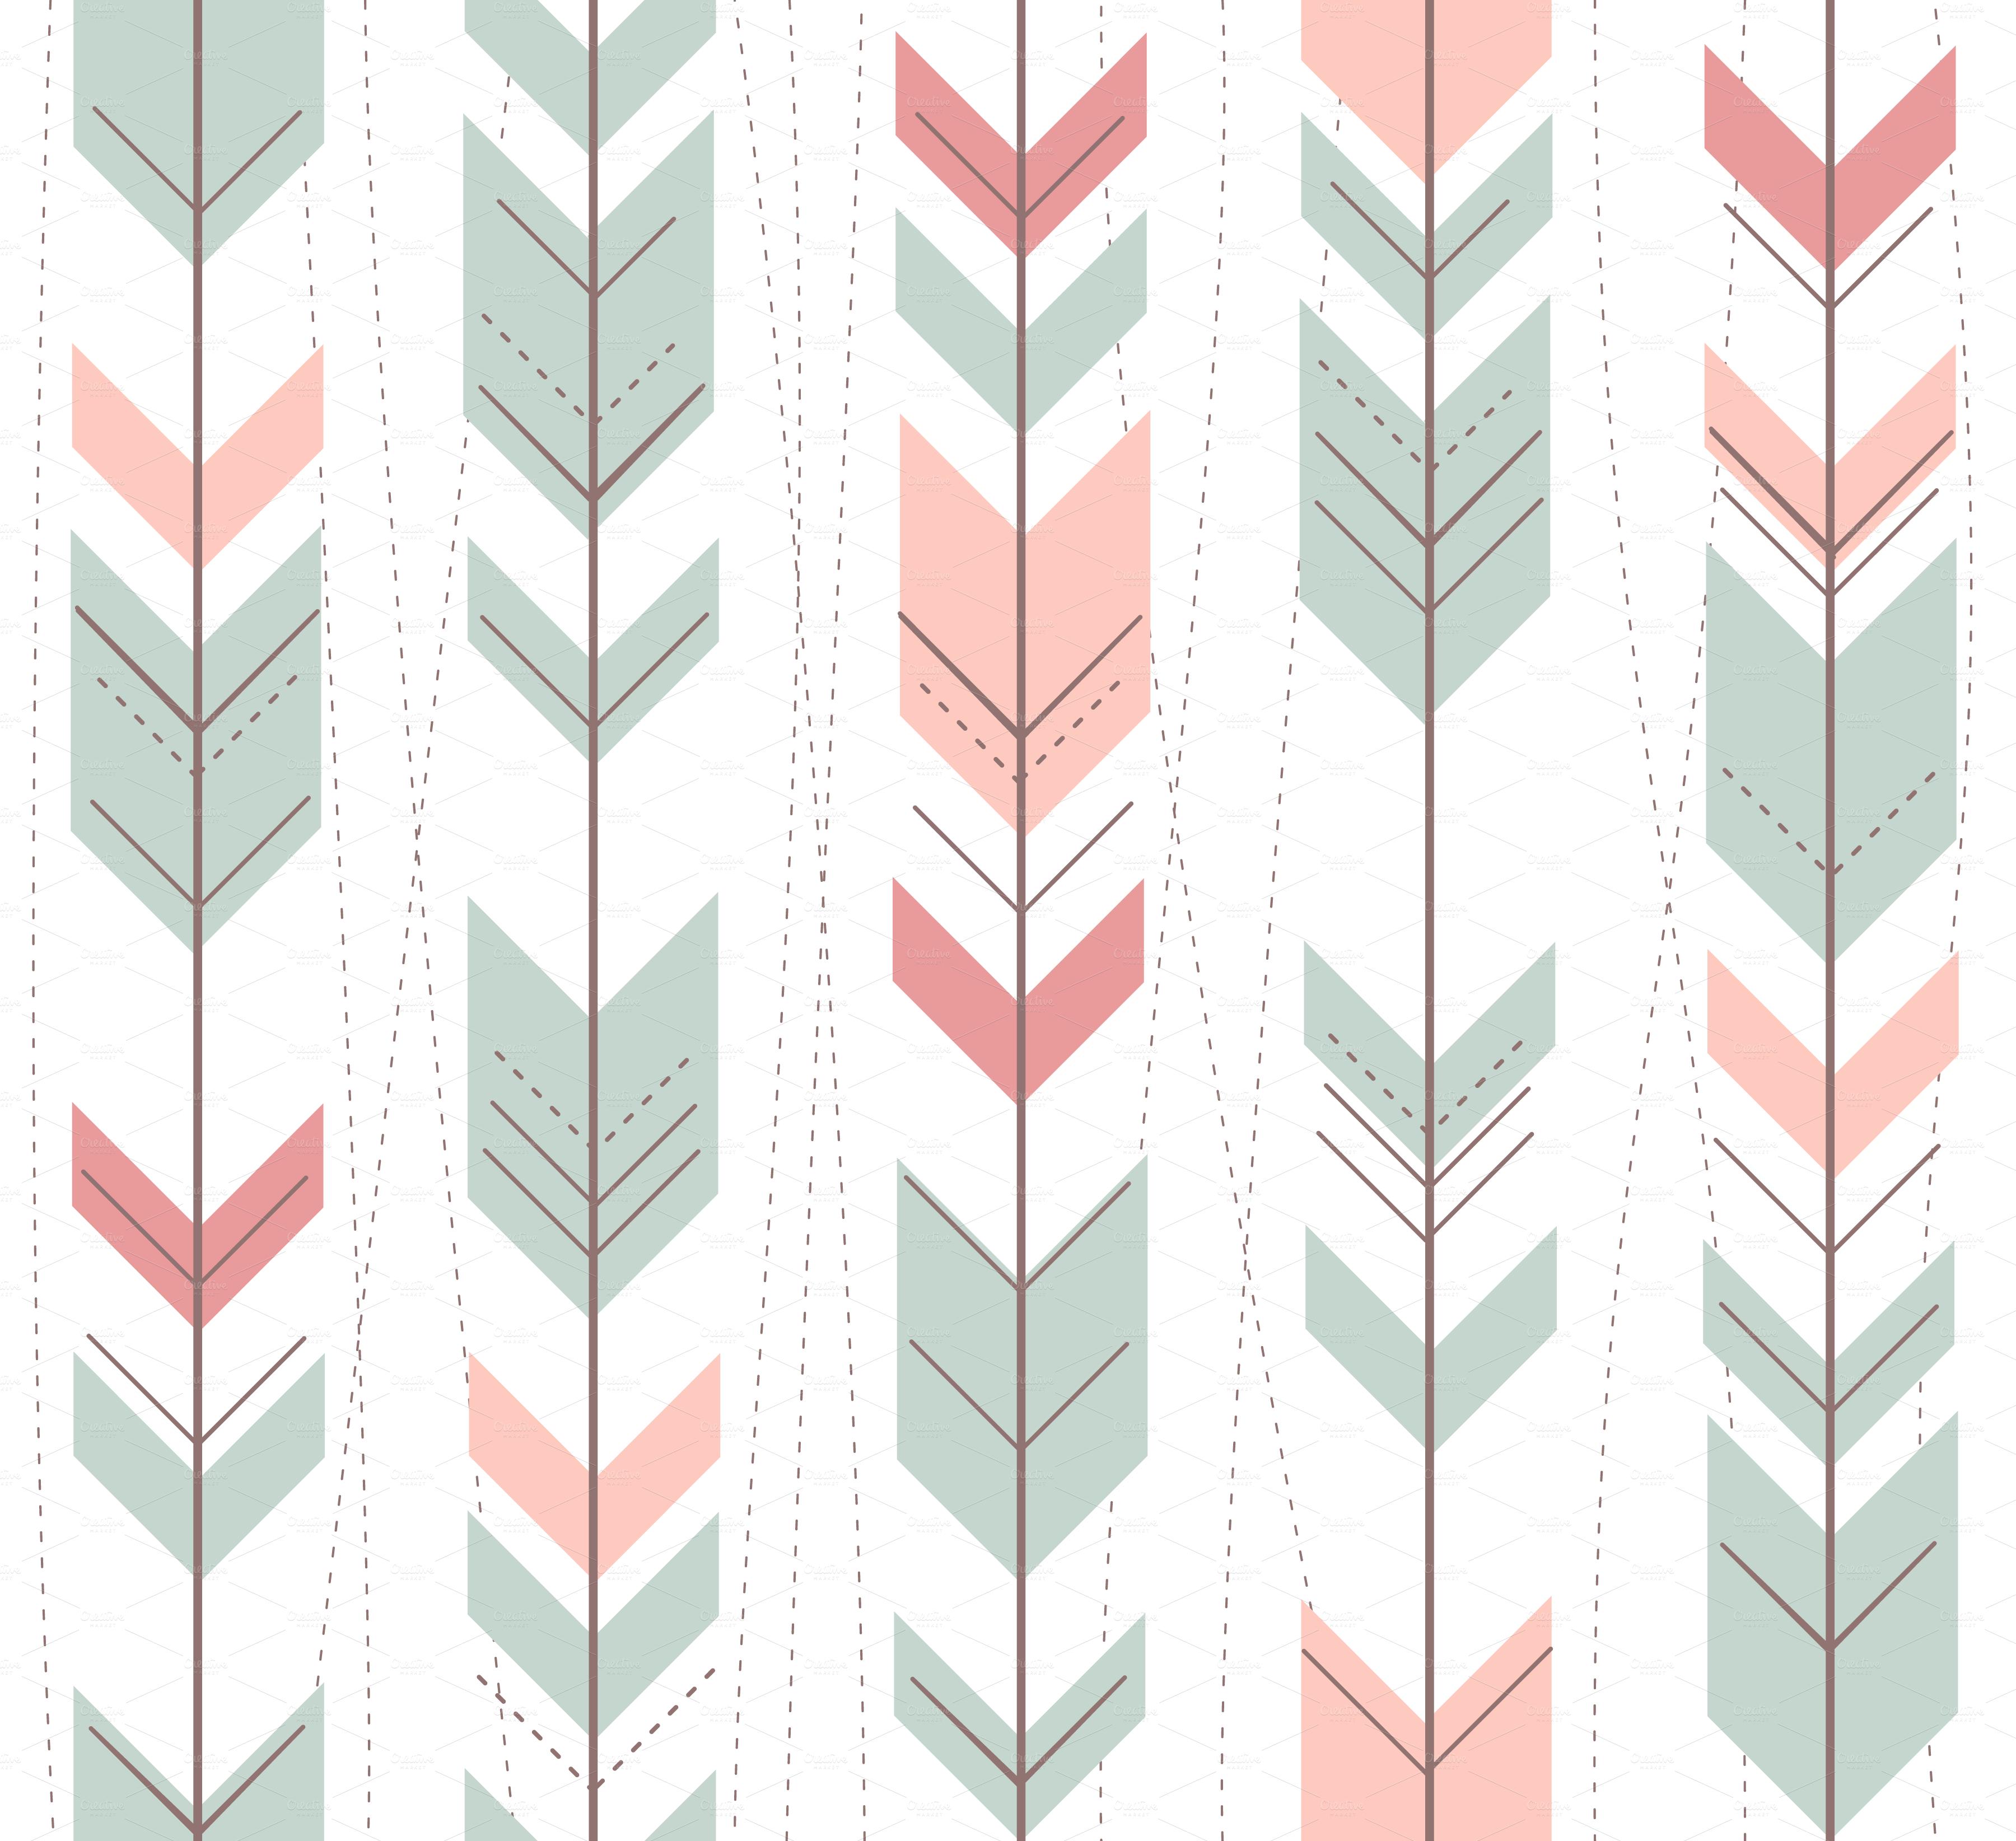 tribal wallpaper pattern - photo #24